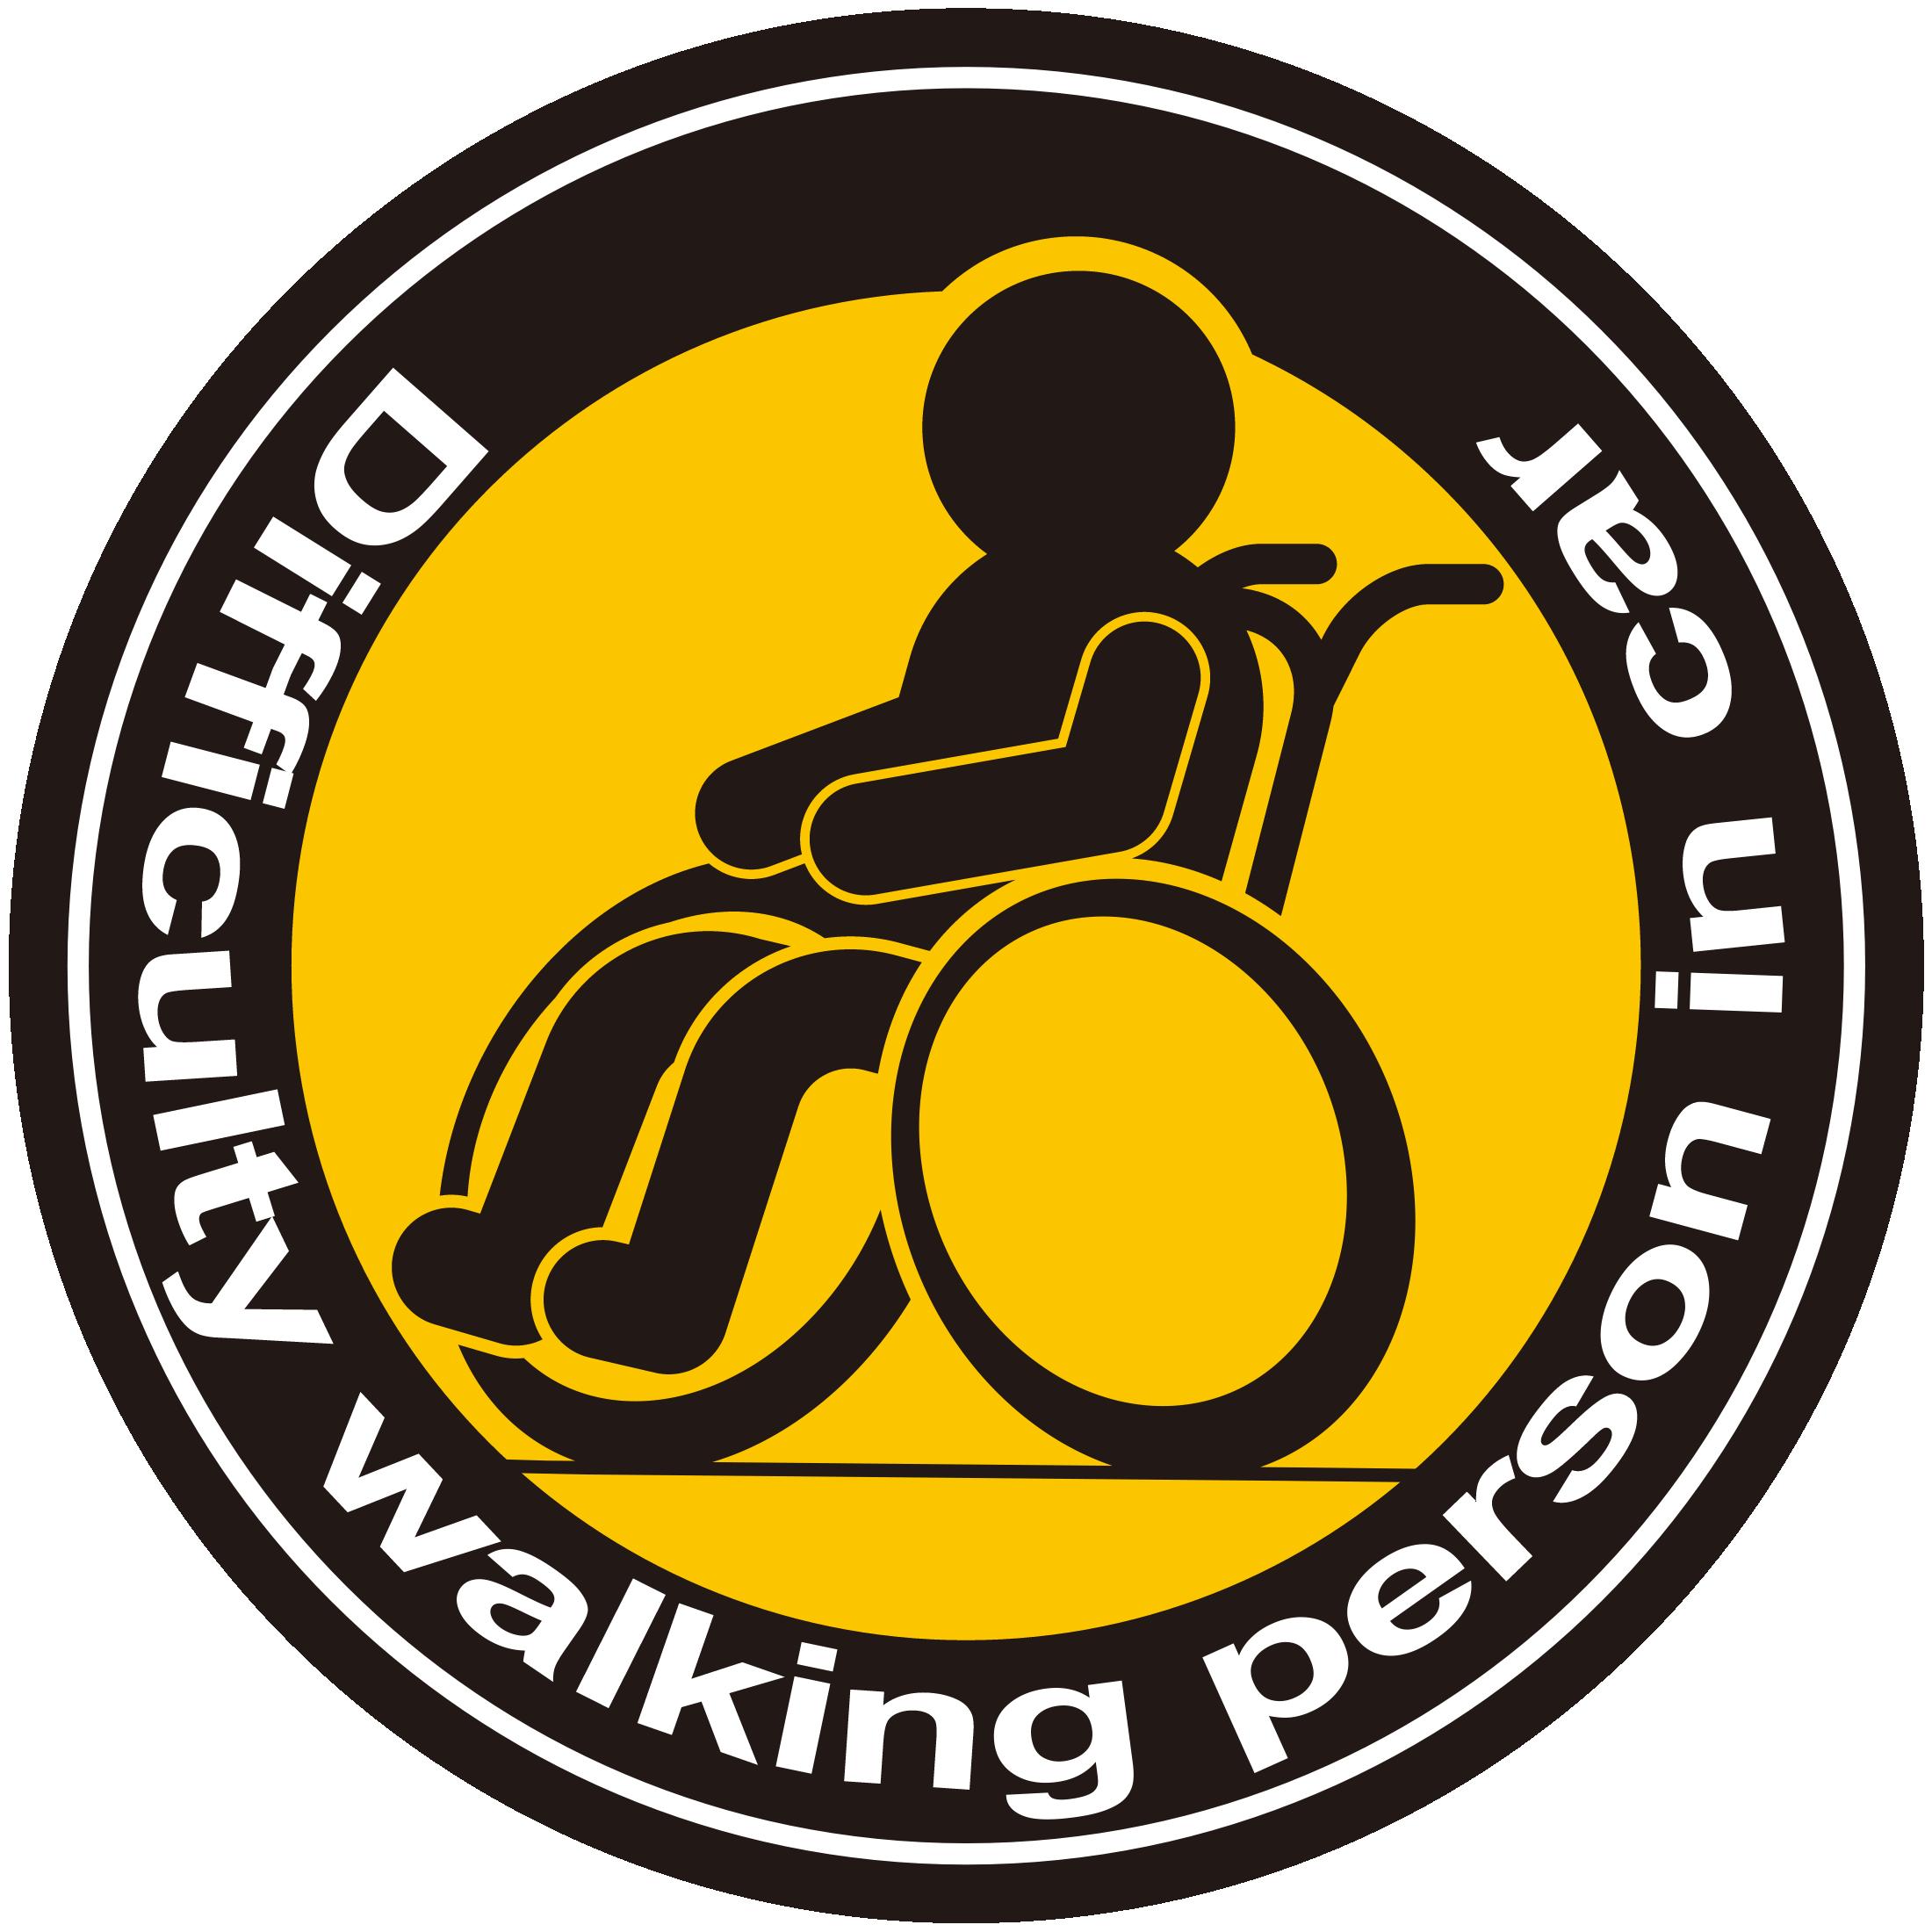 Difficulty walking parson in car ステッカー(黒×黄色)